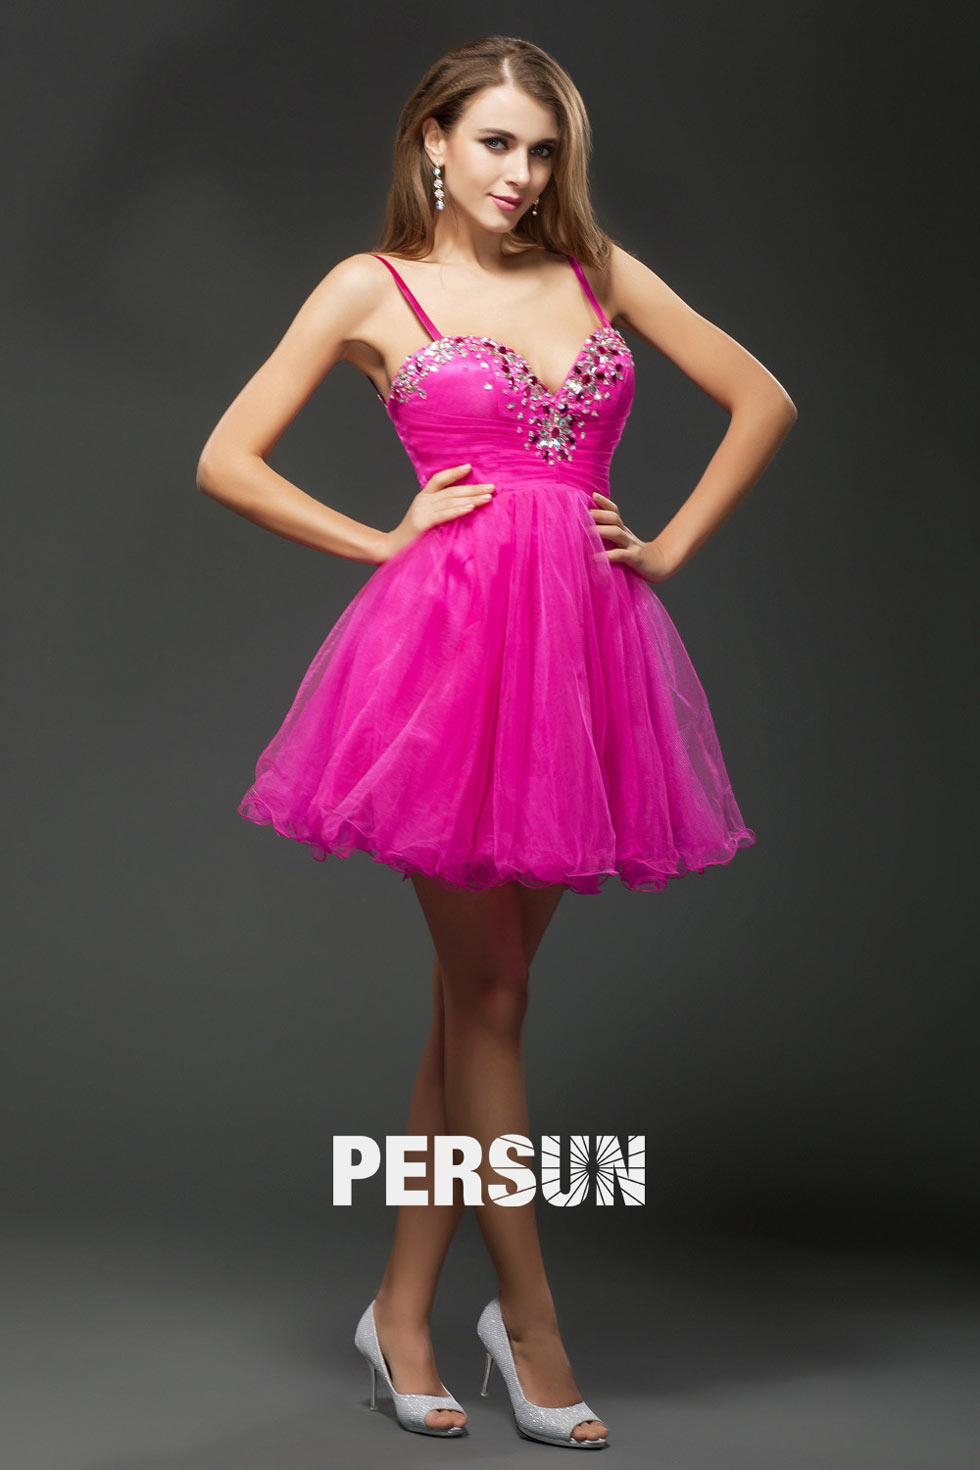 Mini robe rose bonbon avec bretelles empire ornée de bijoux